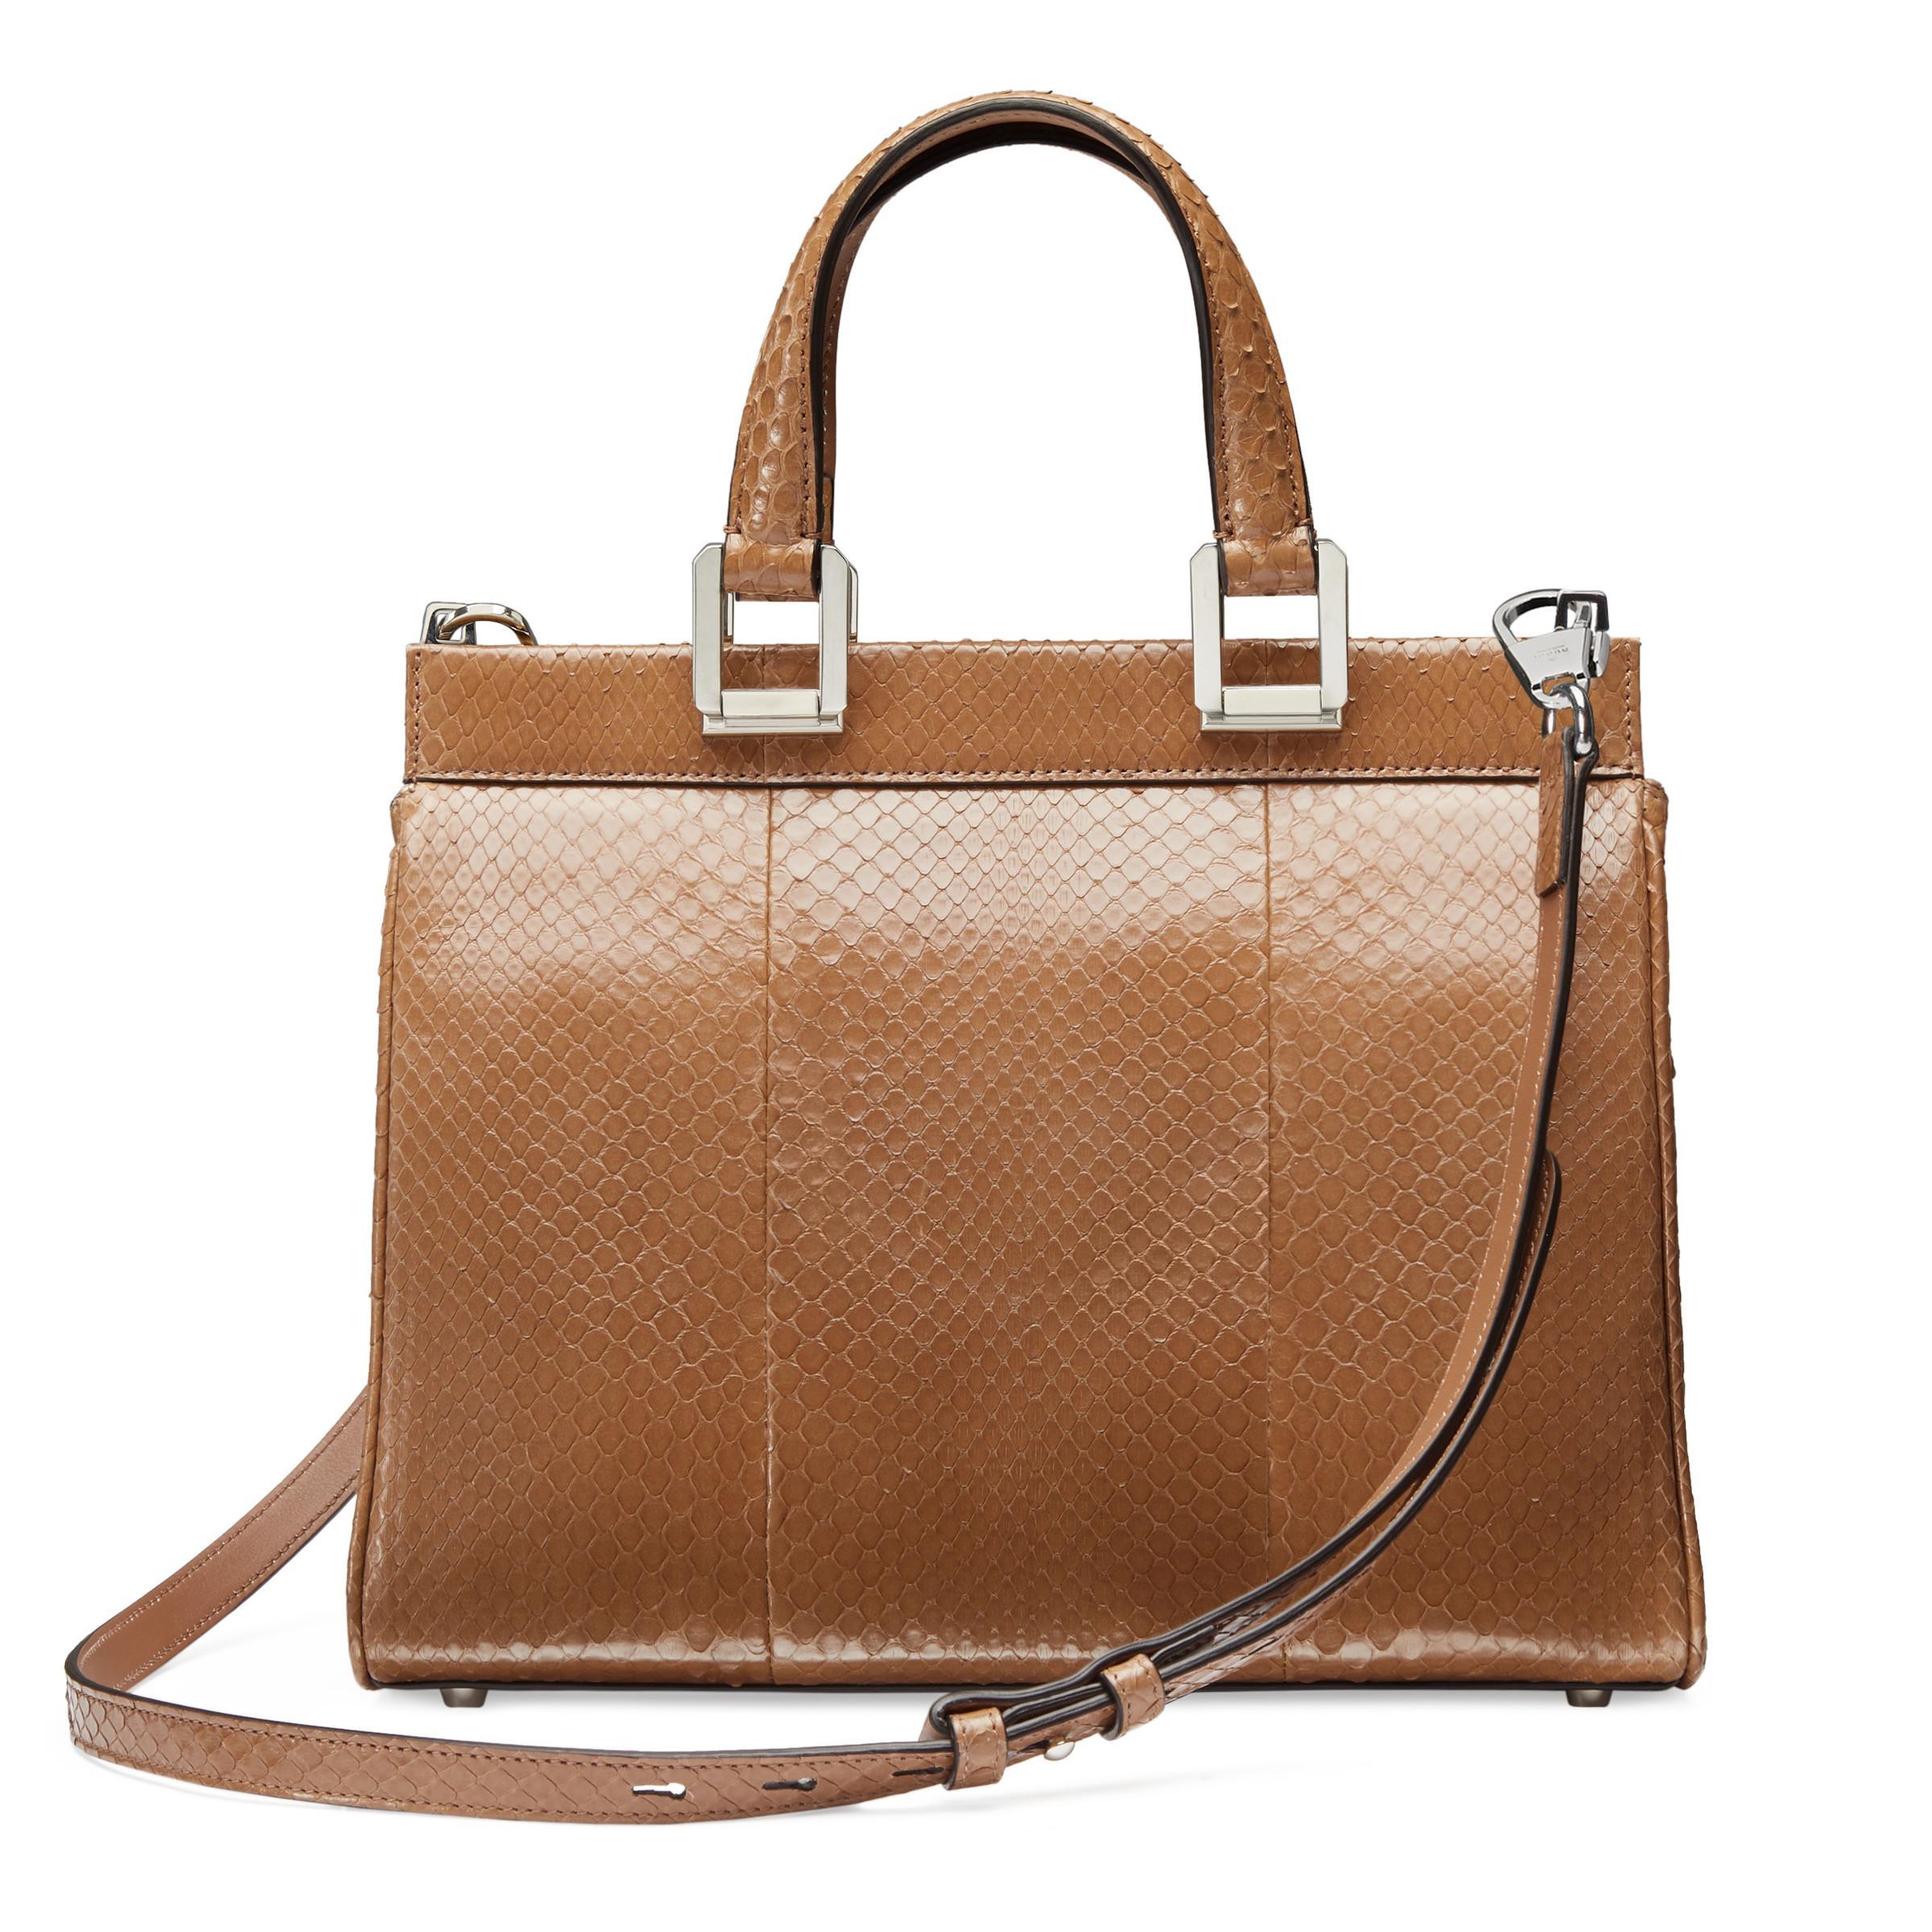 4518b303d57 Gucci - Natural Zumi Snakeskin Small Top Handle Bag - Lyst. View fullscreen